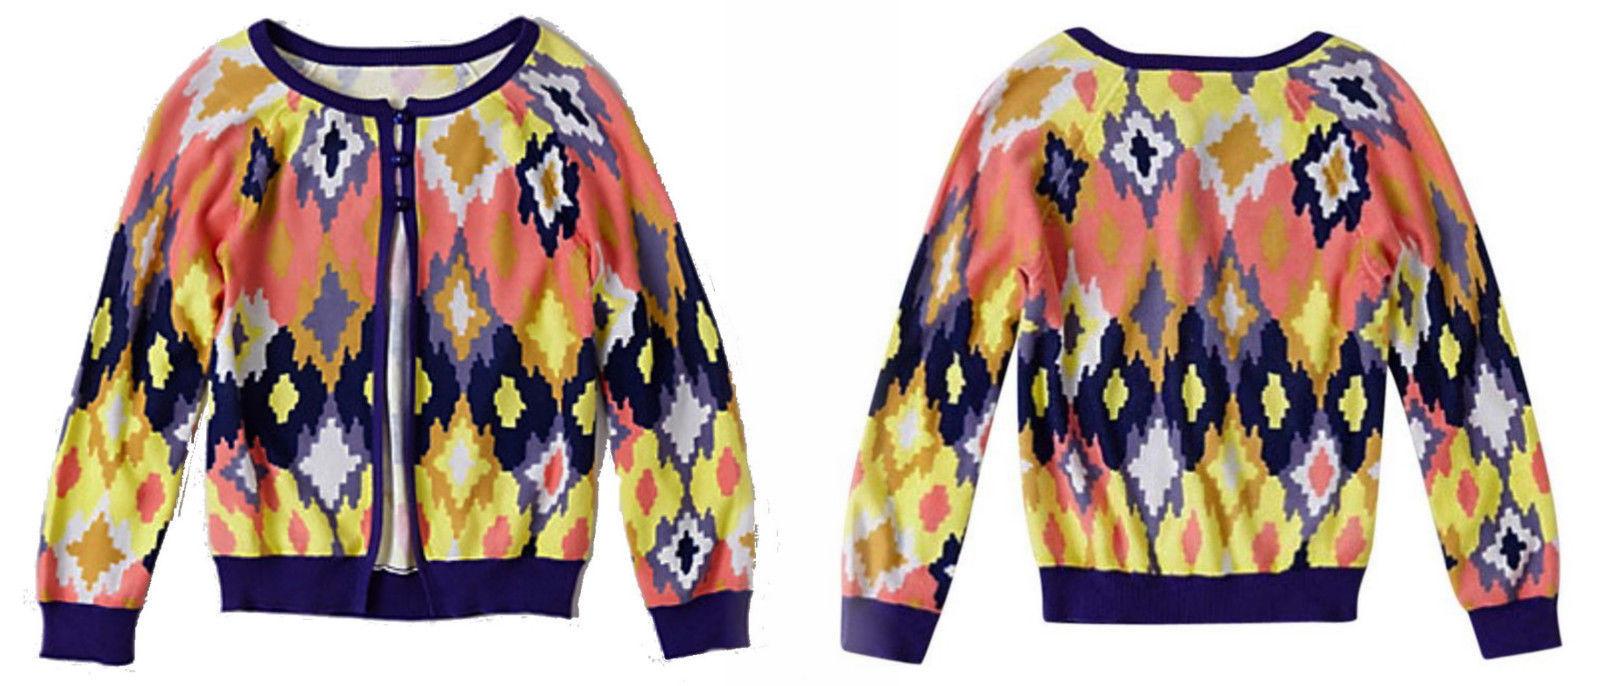 Anthropologie Flickered Ikat Cardigan Medium 6 8 Tracy Reese Buttondown Sweater - $83.30